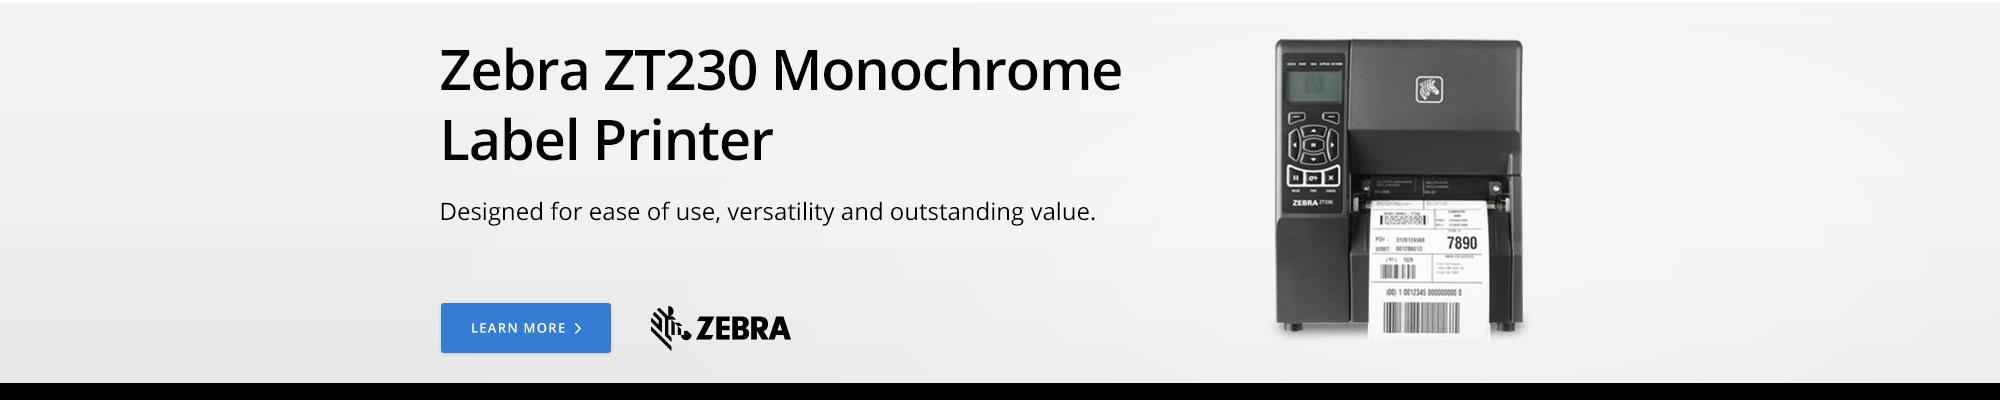 Zebra ZT230 Monochrome Label Printer